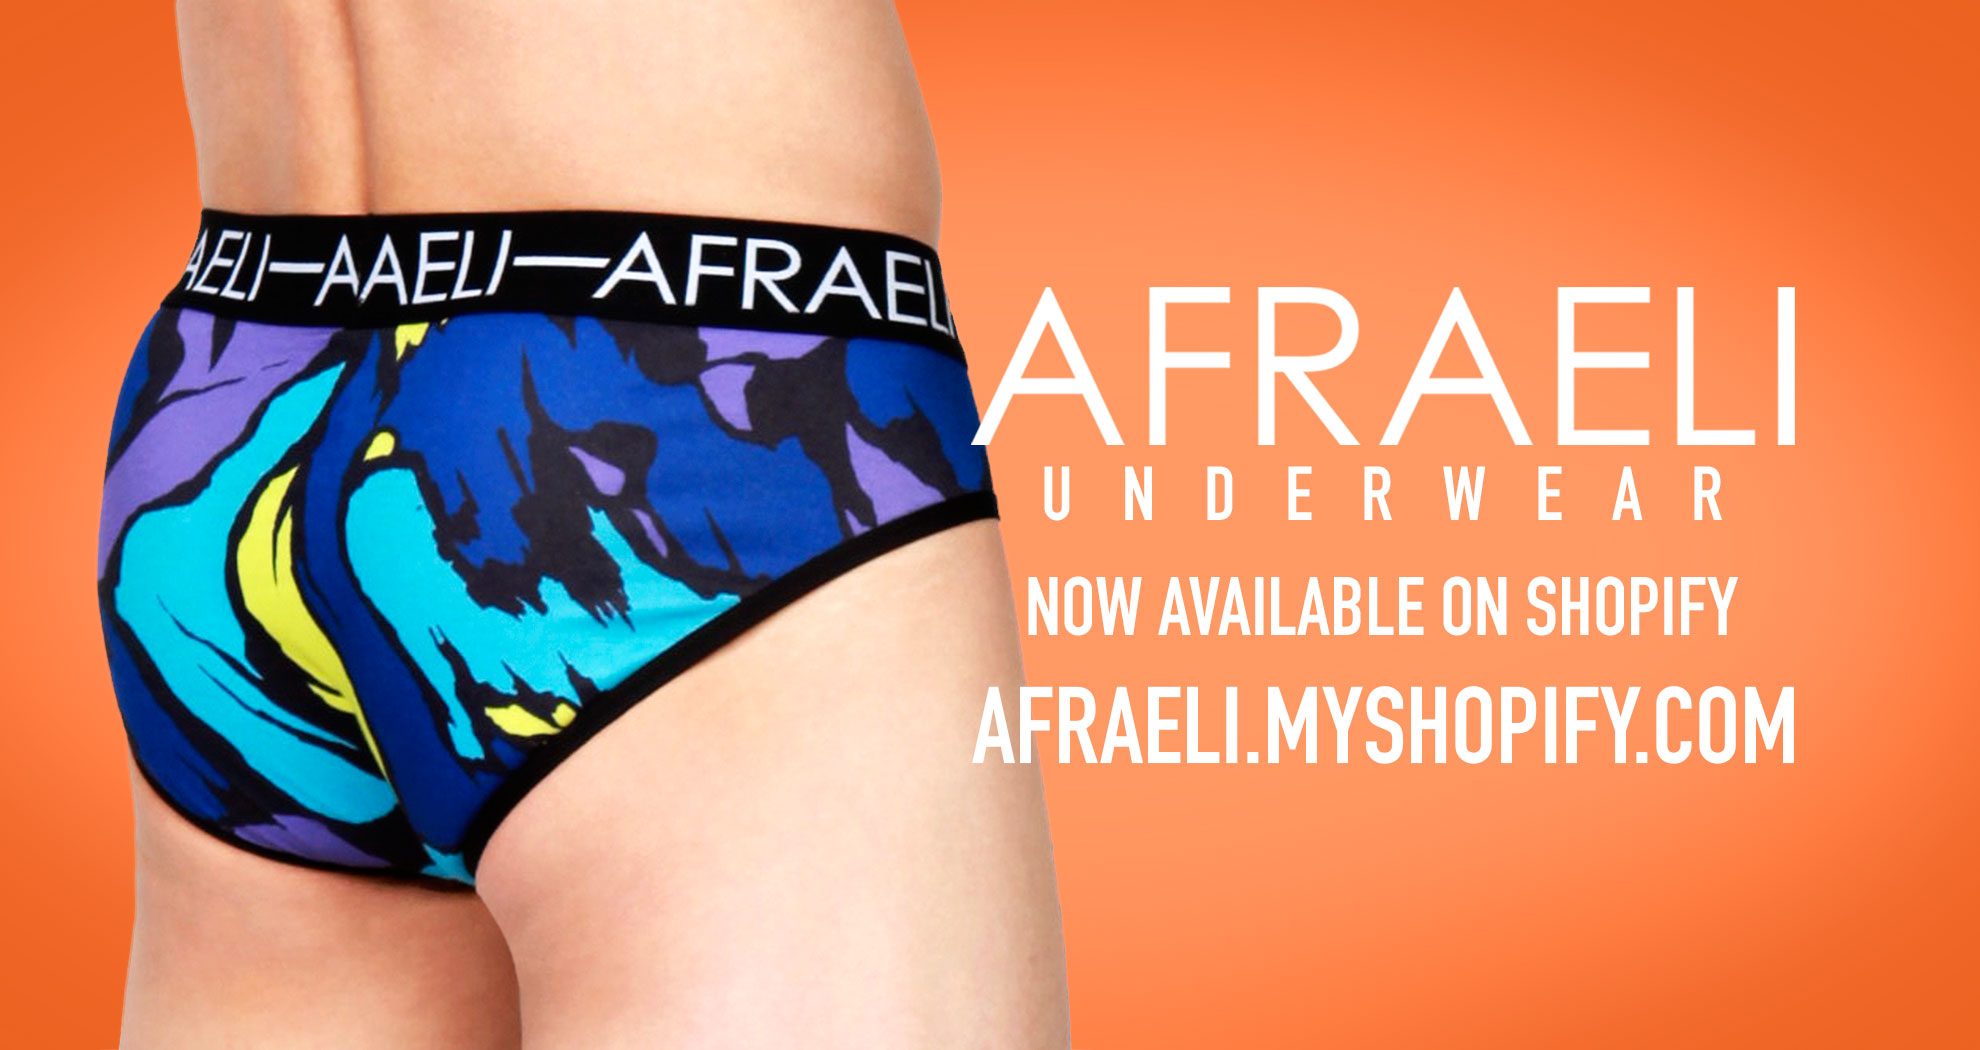 Afraeli-Shopify.jpg